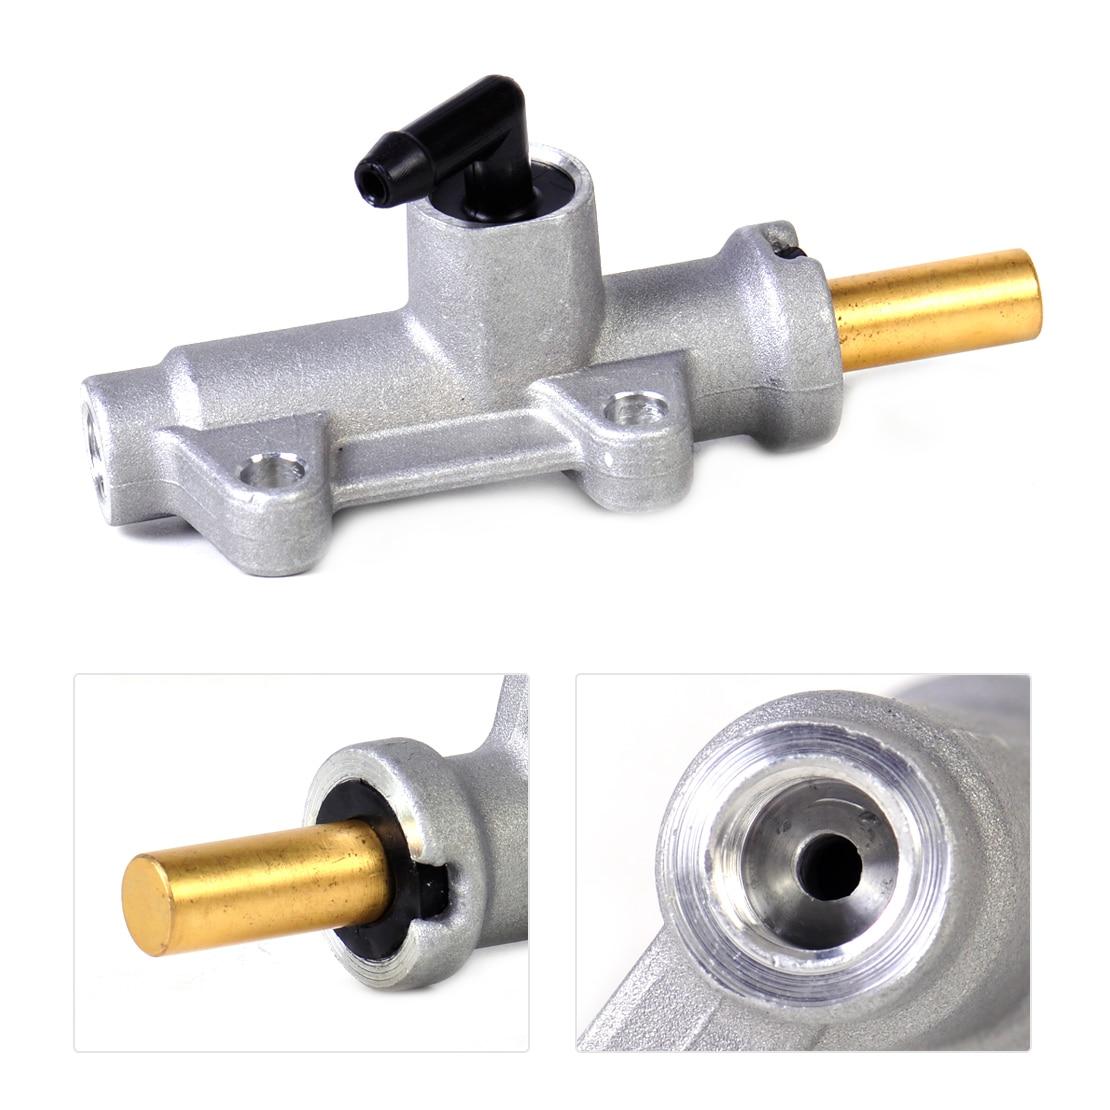 CITALL 1Pc Rear Brake Master Cylinder 1911113 1910301fit for Polaris Sportsman 335 400 450 500 600 700 800 Worker 500 335